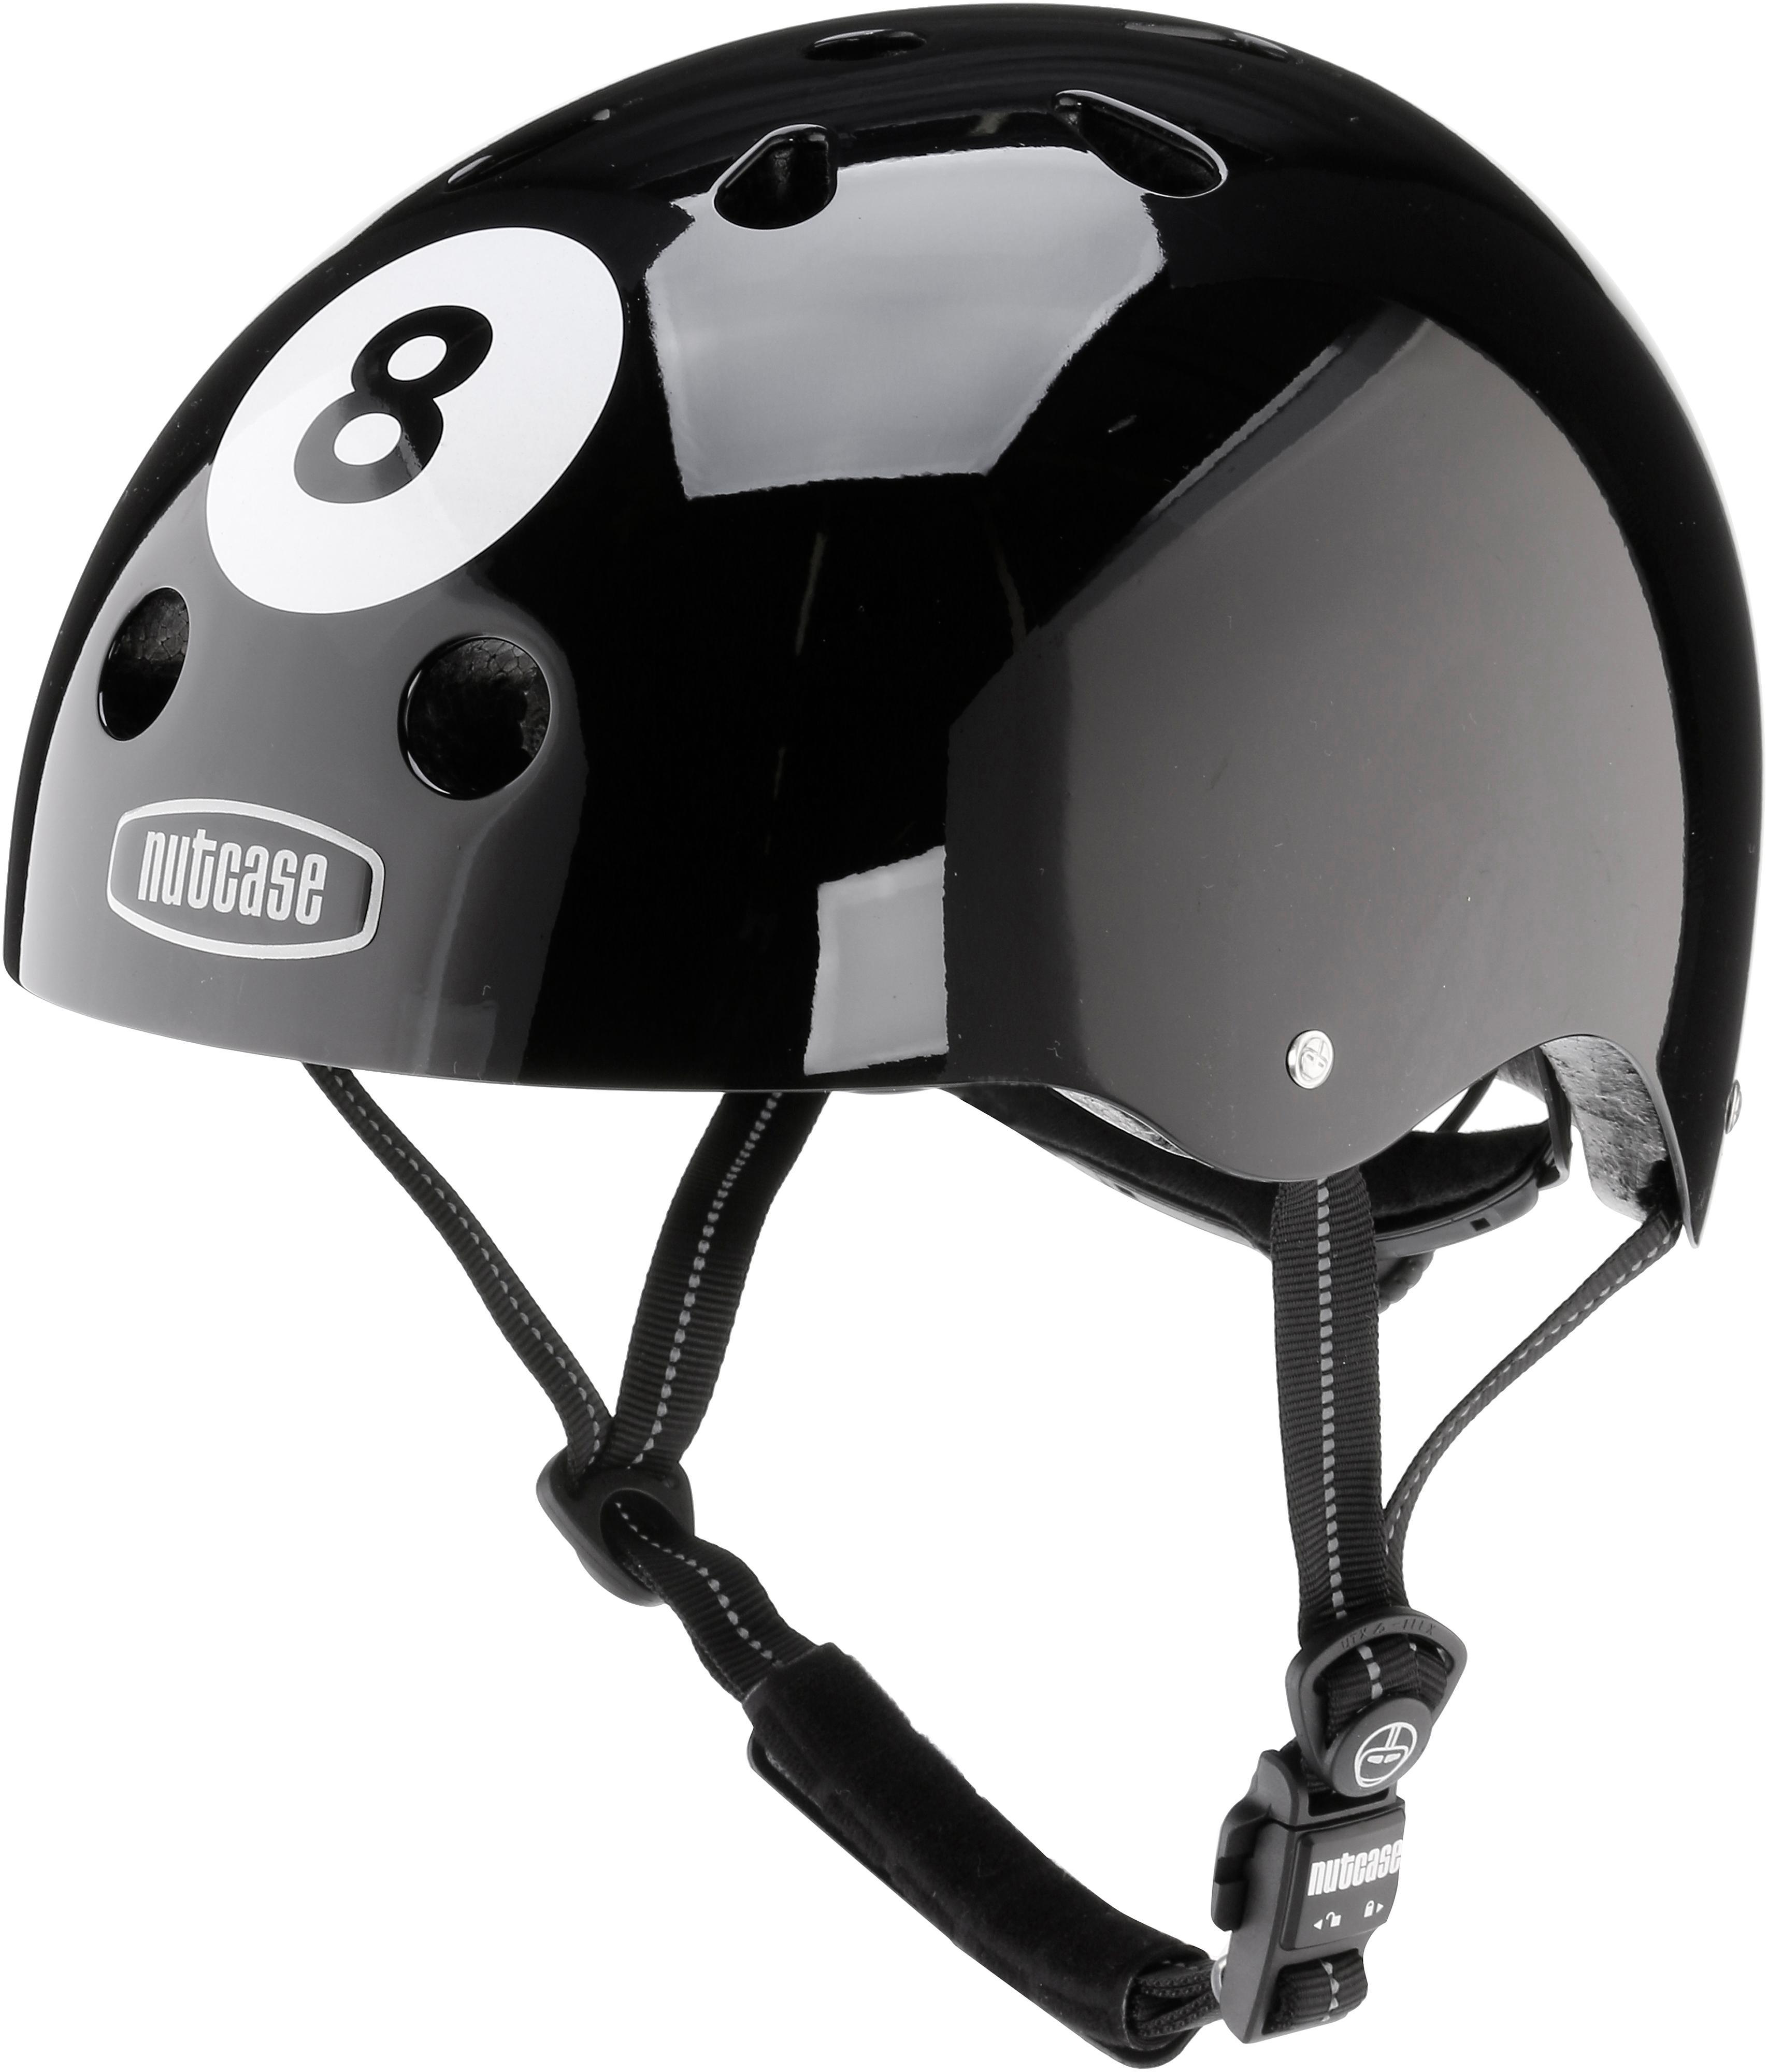 great nutcase ball fahrradhelm schwarz with fahrrad helme